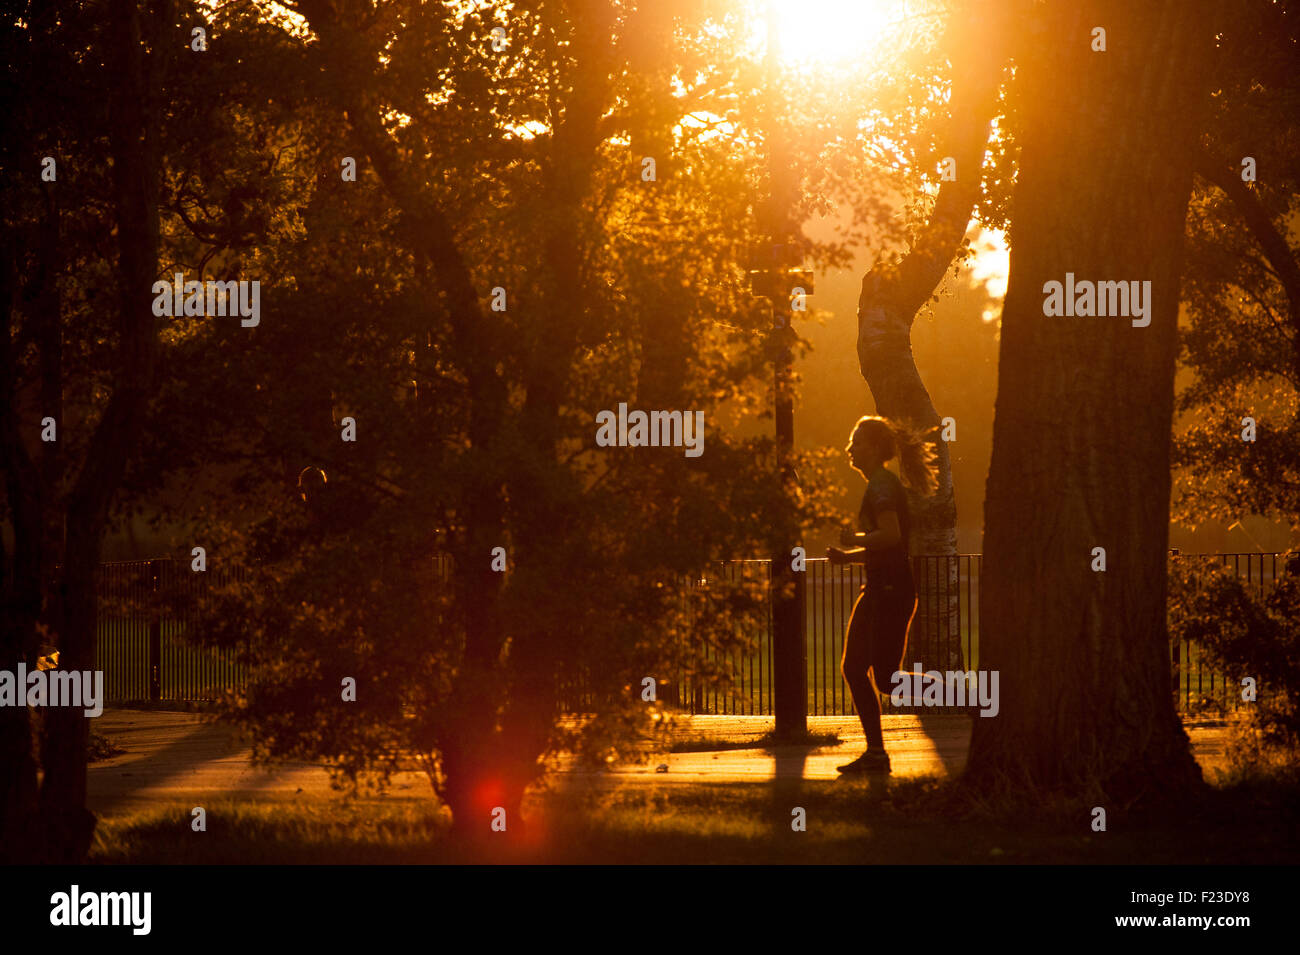 Am frühen Morgen in einem Londoner park Stockbild